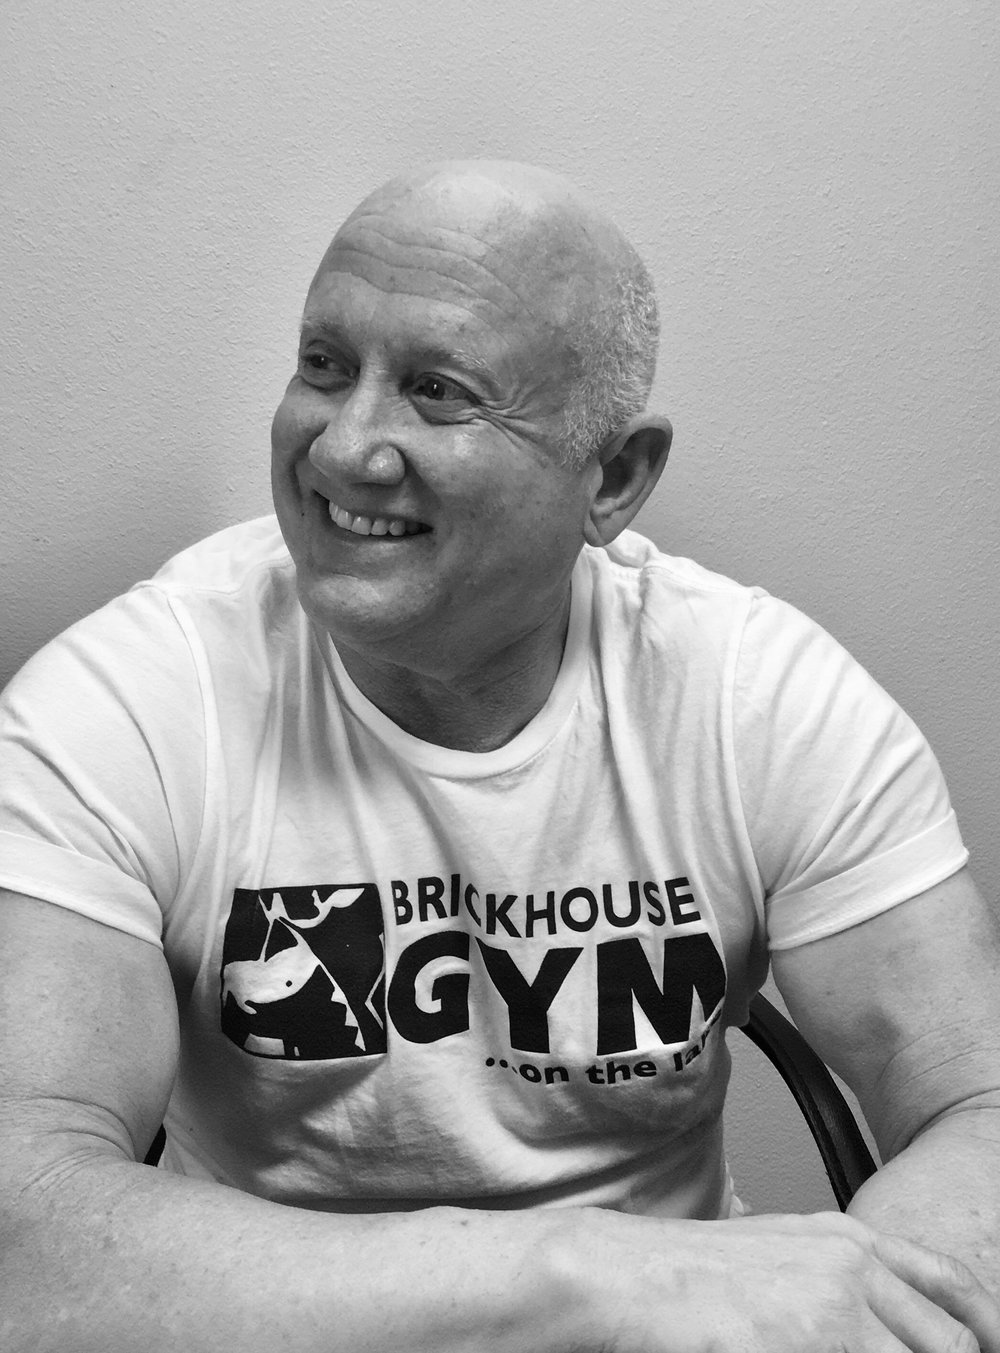 Mike Jones - The Brickhouse Gym Owner